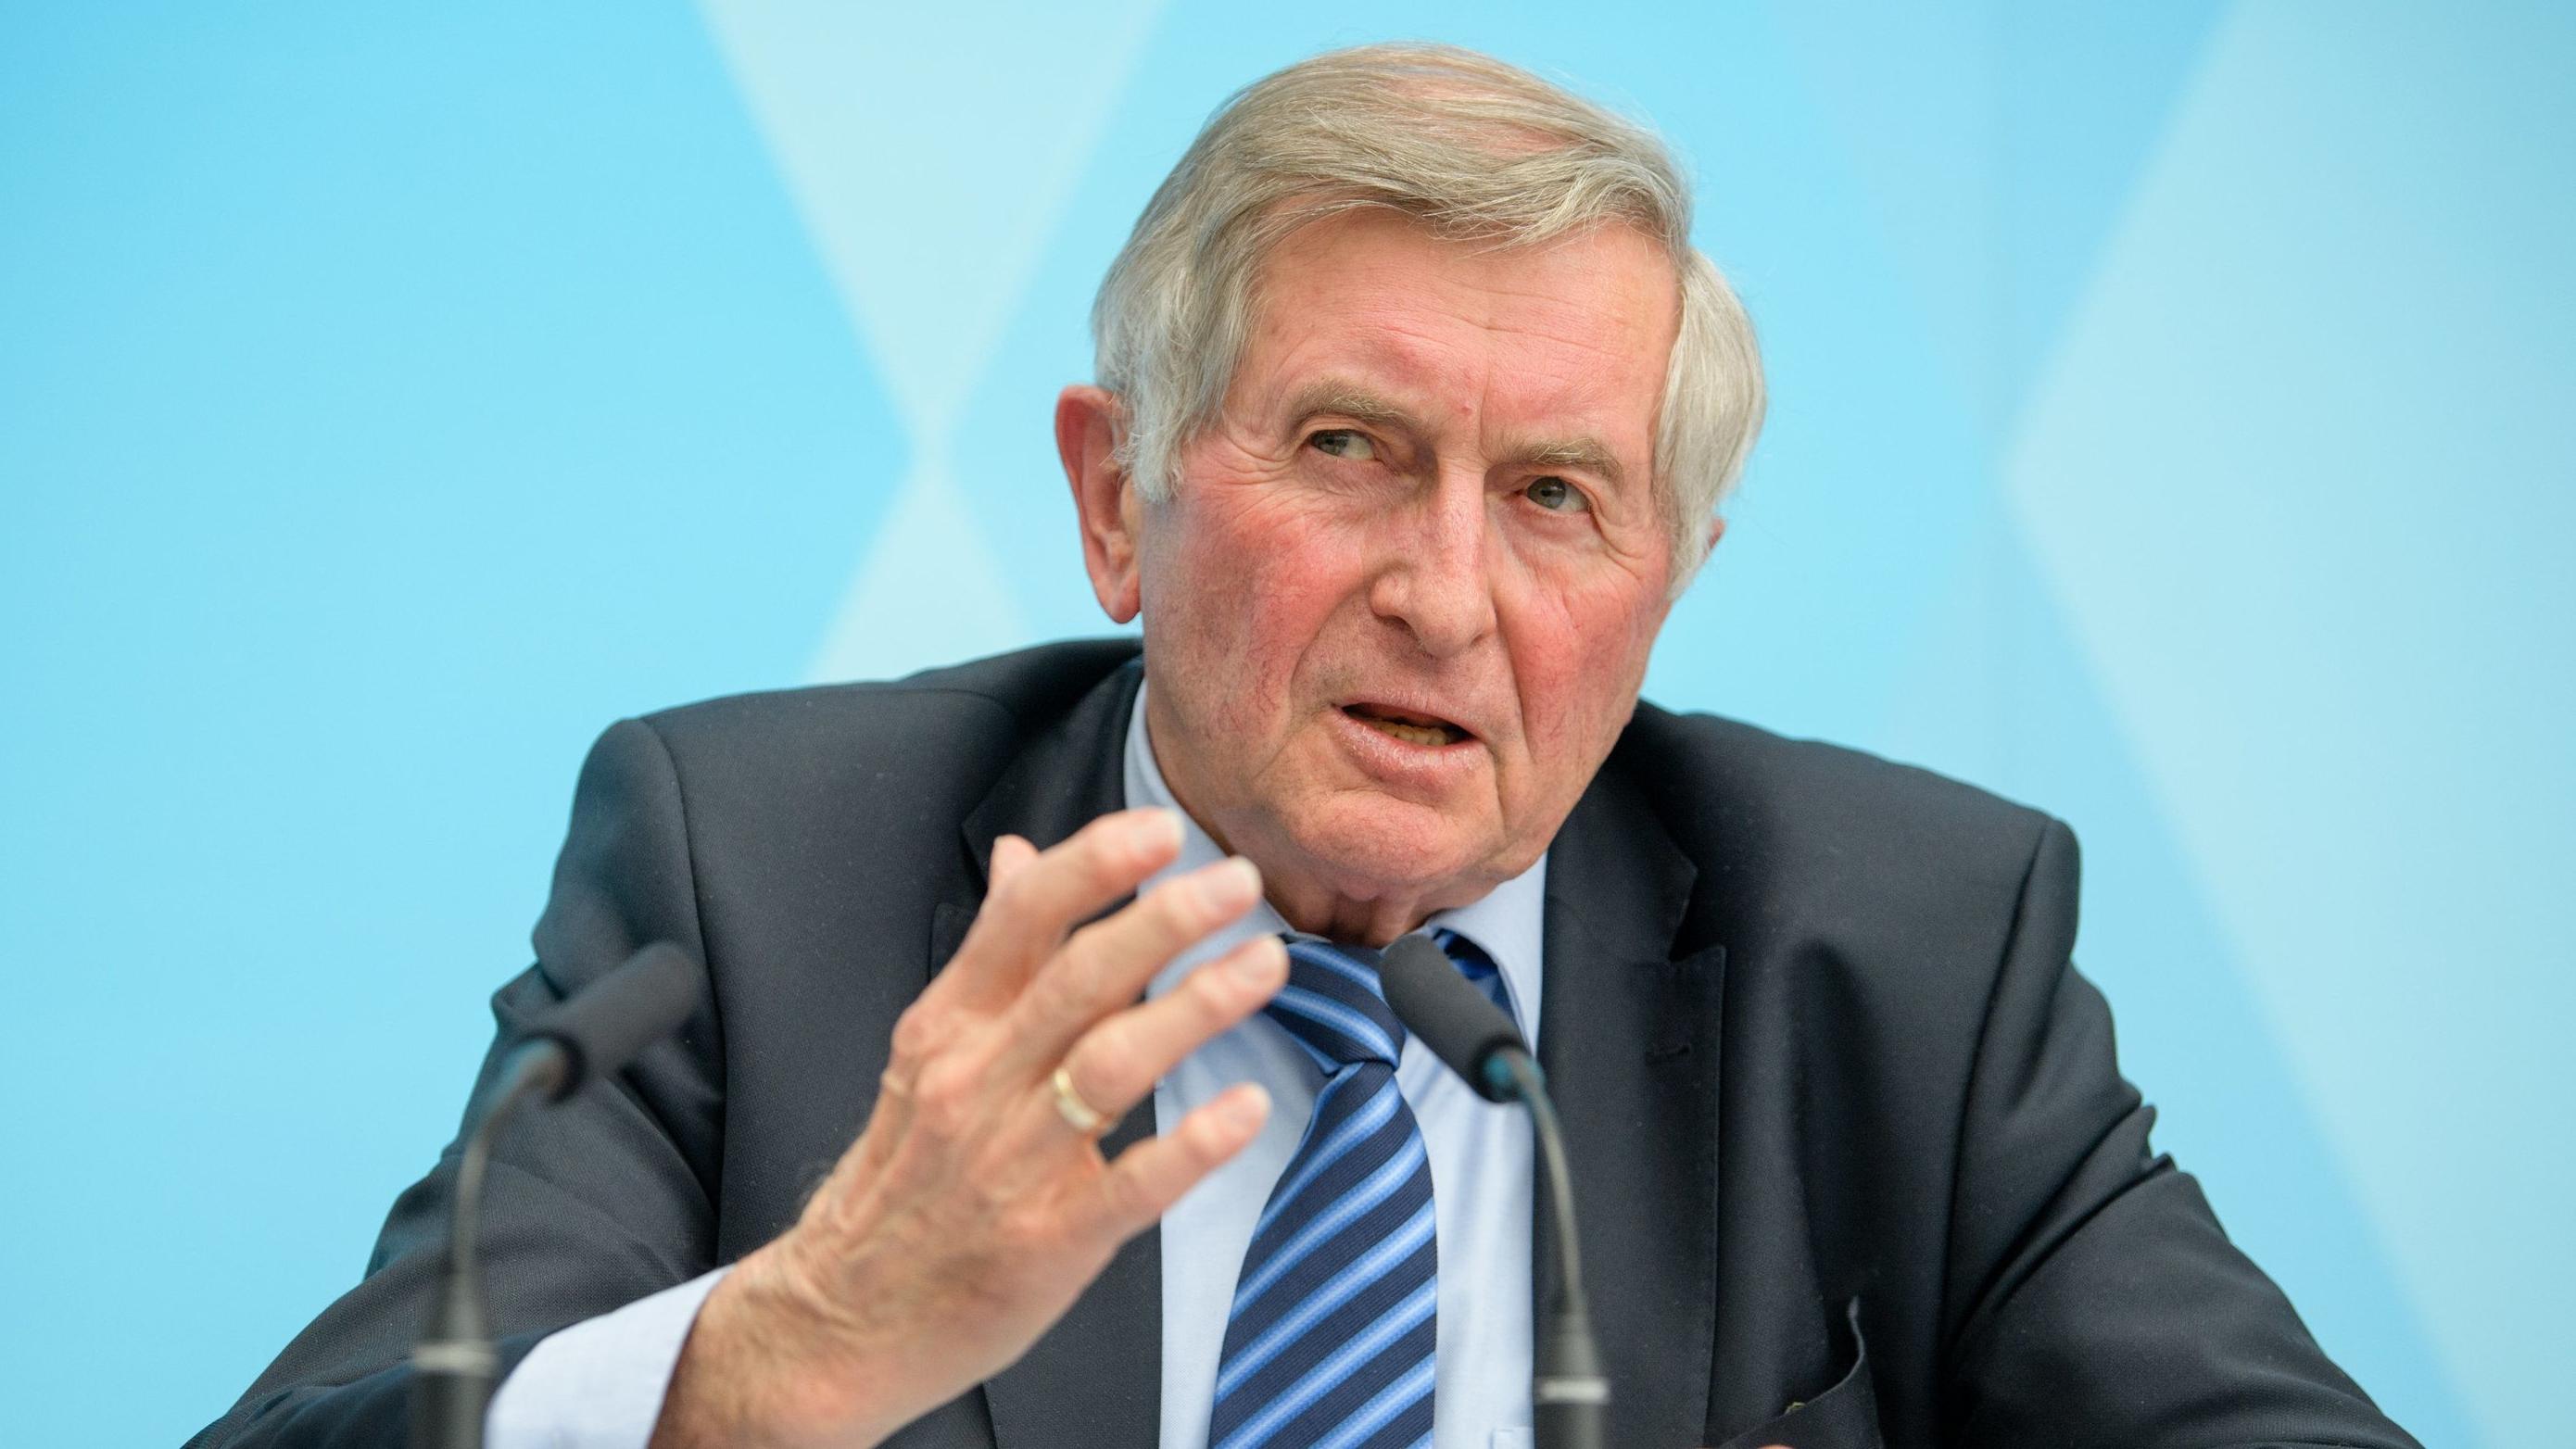 Alois Glück, ehemaliger Landtagspräsident